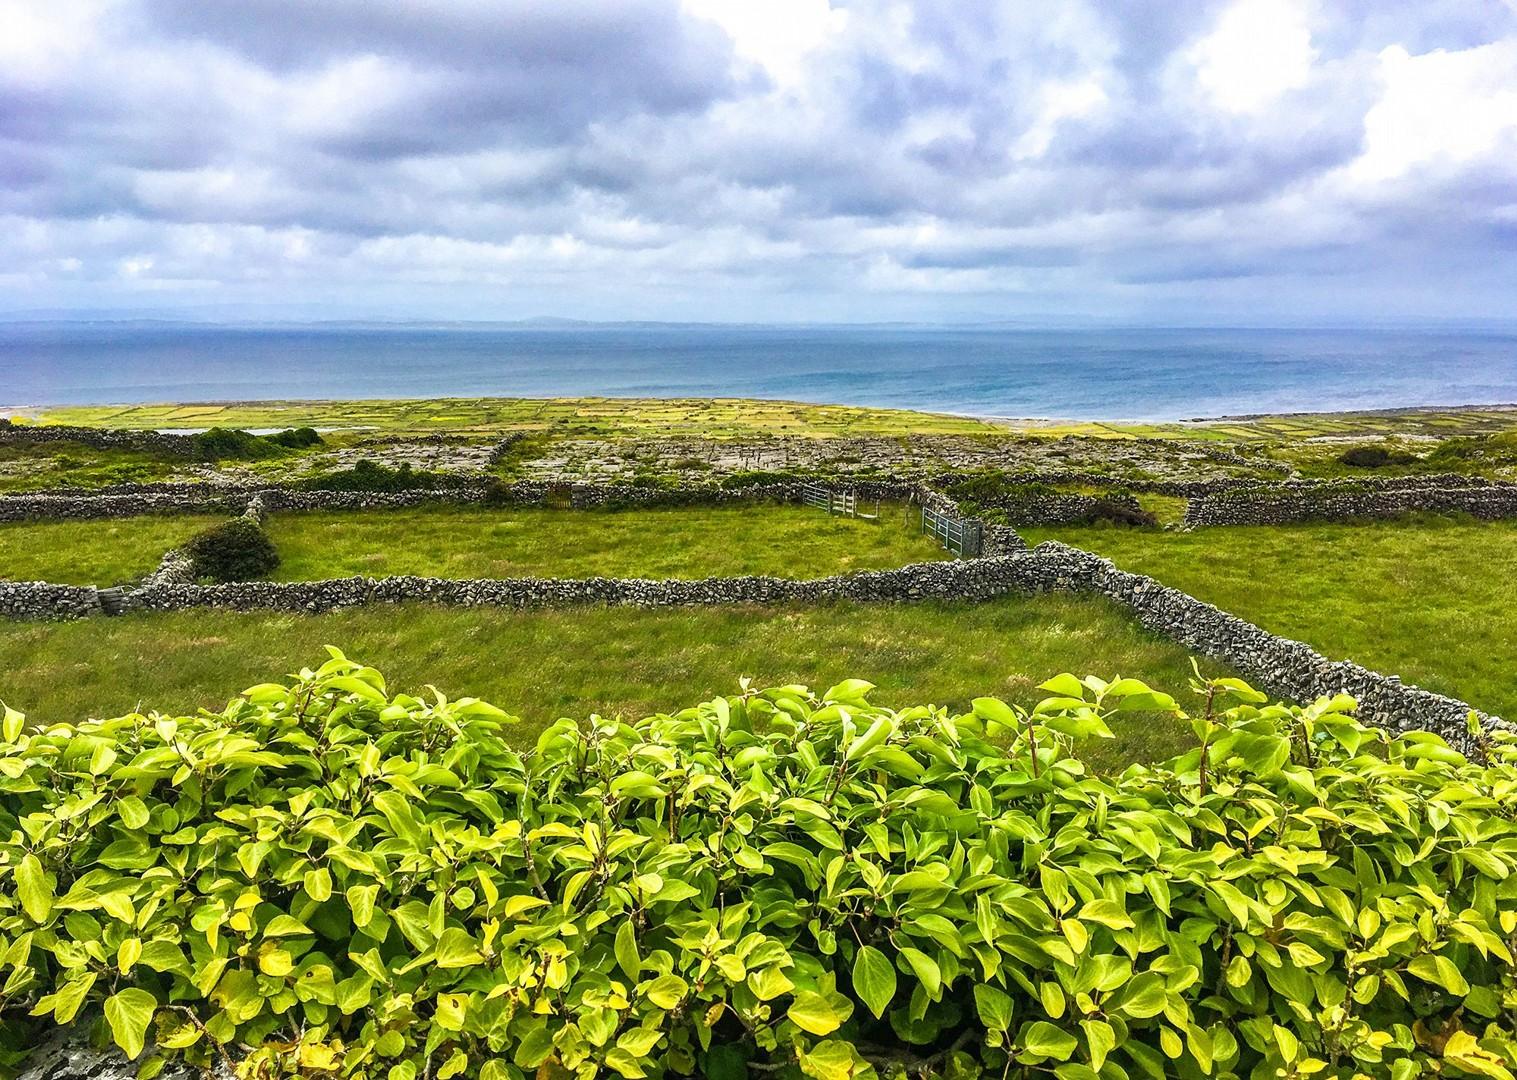 connemara-and-aran-isles-trip-self-guided-leisure-cycling-holiday.jpg - NEW! Ireland - Connemara and the Aran Isles - Leisure Cycling